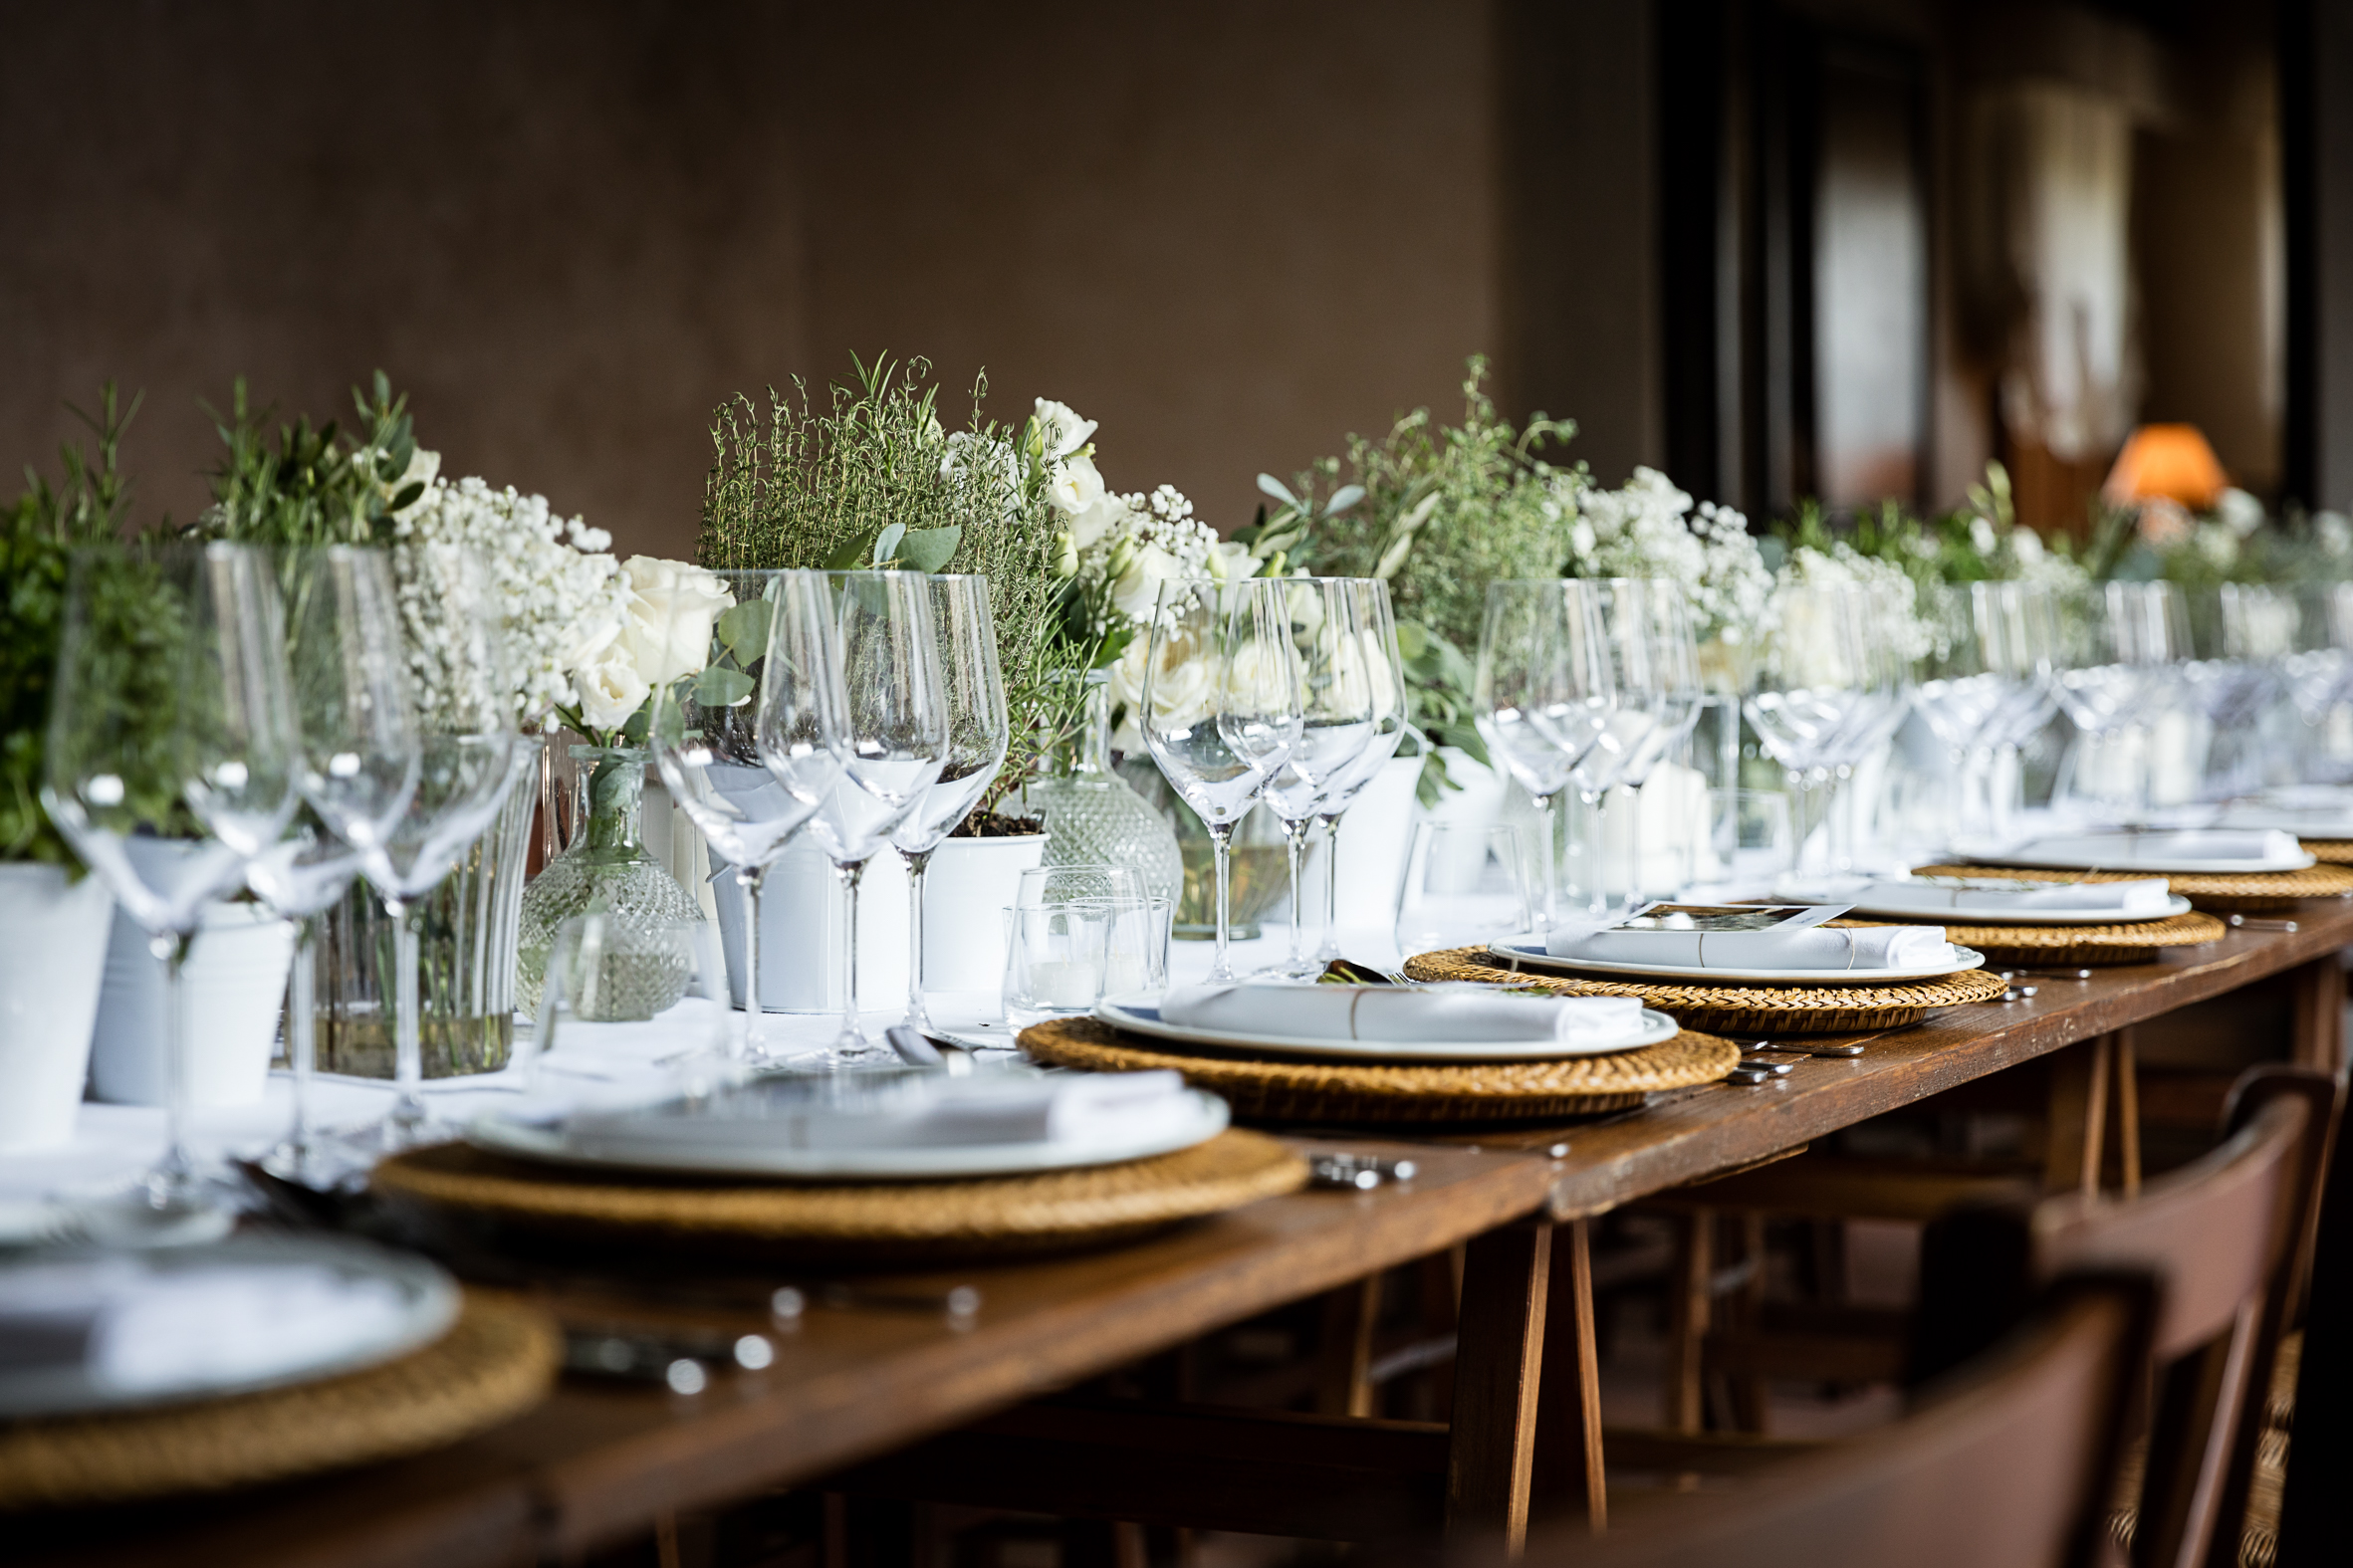 Hochzeit Andrea und Dario_Toskana 2017_169_a4.jpg